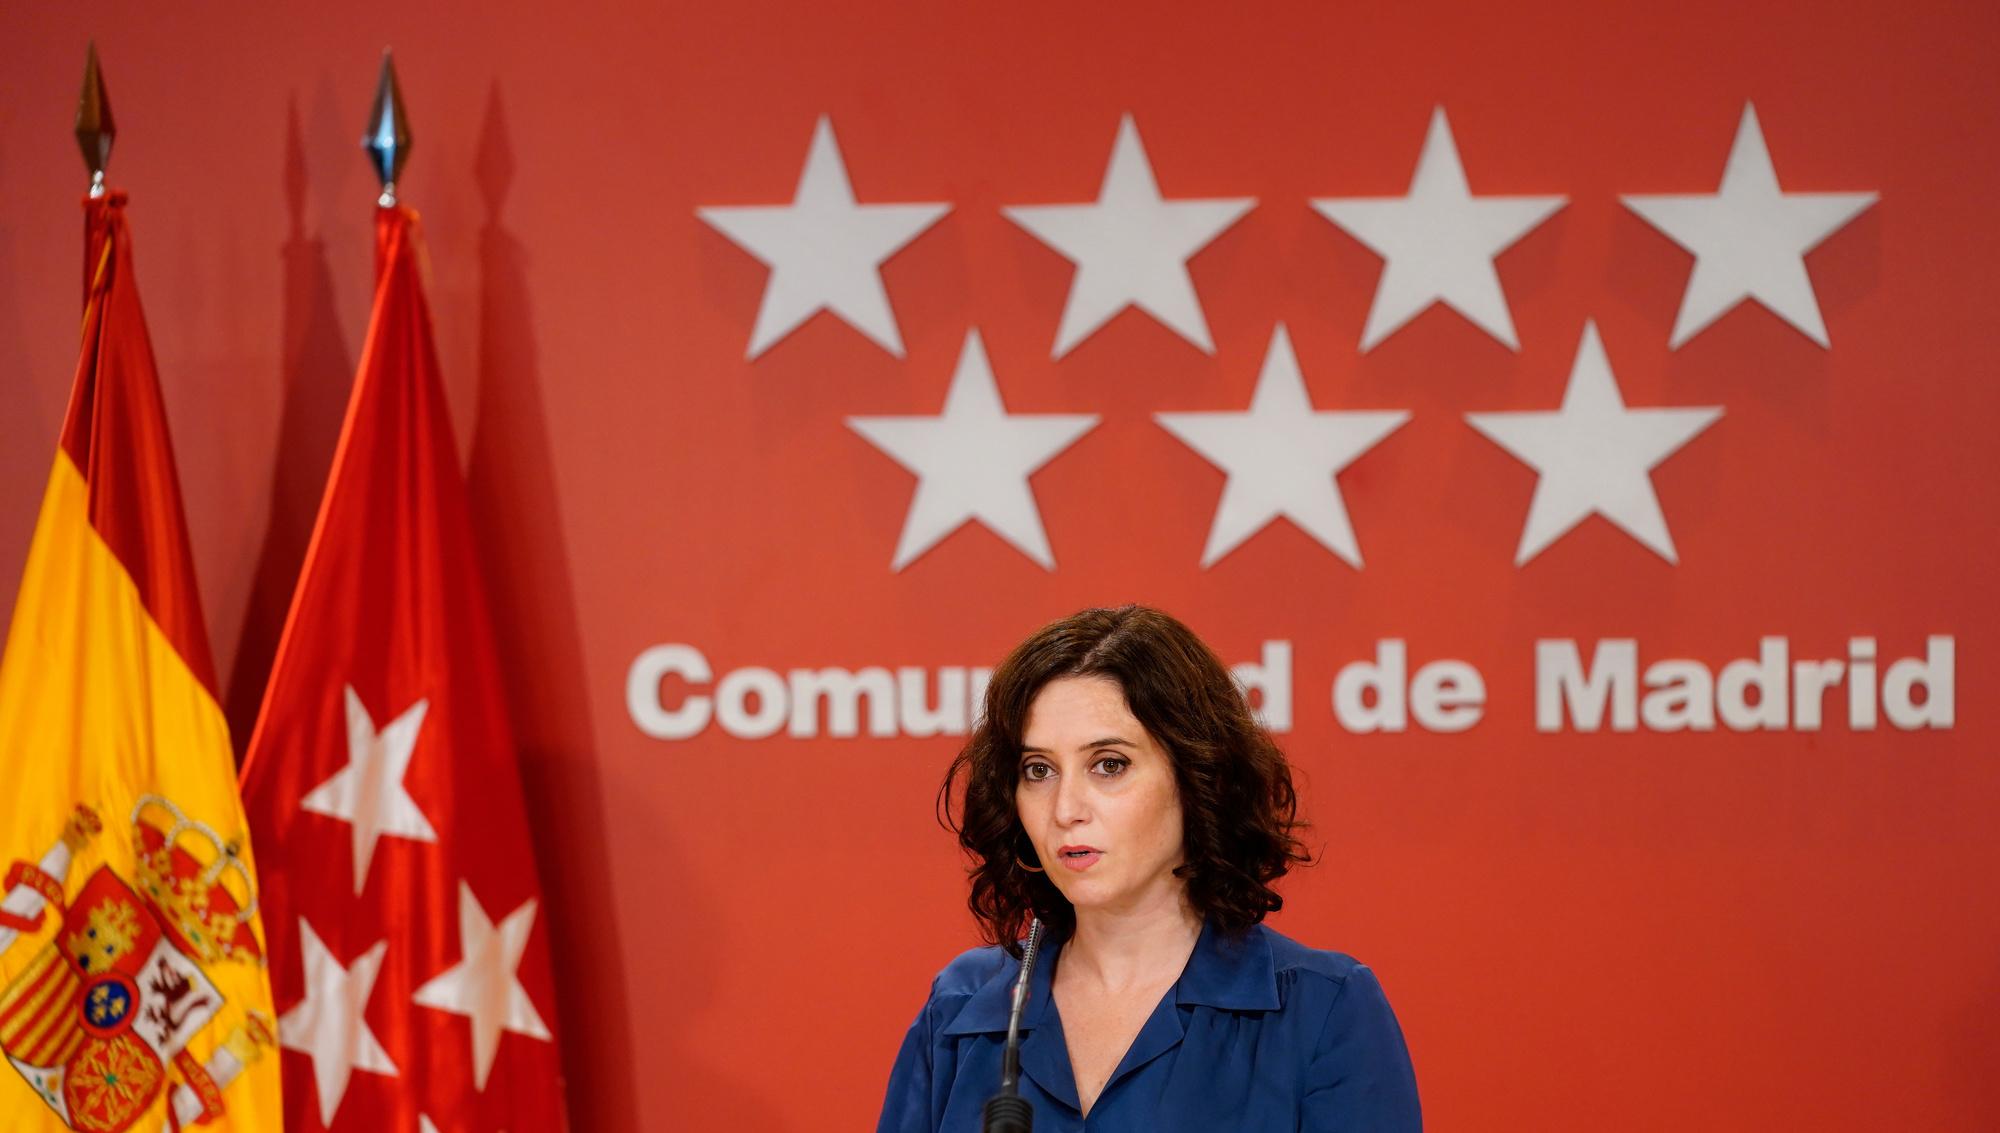 Isabel Díaz Ayuso, présidente de la communauté de Madrid, BELGA IMAGE